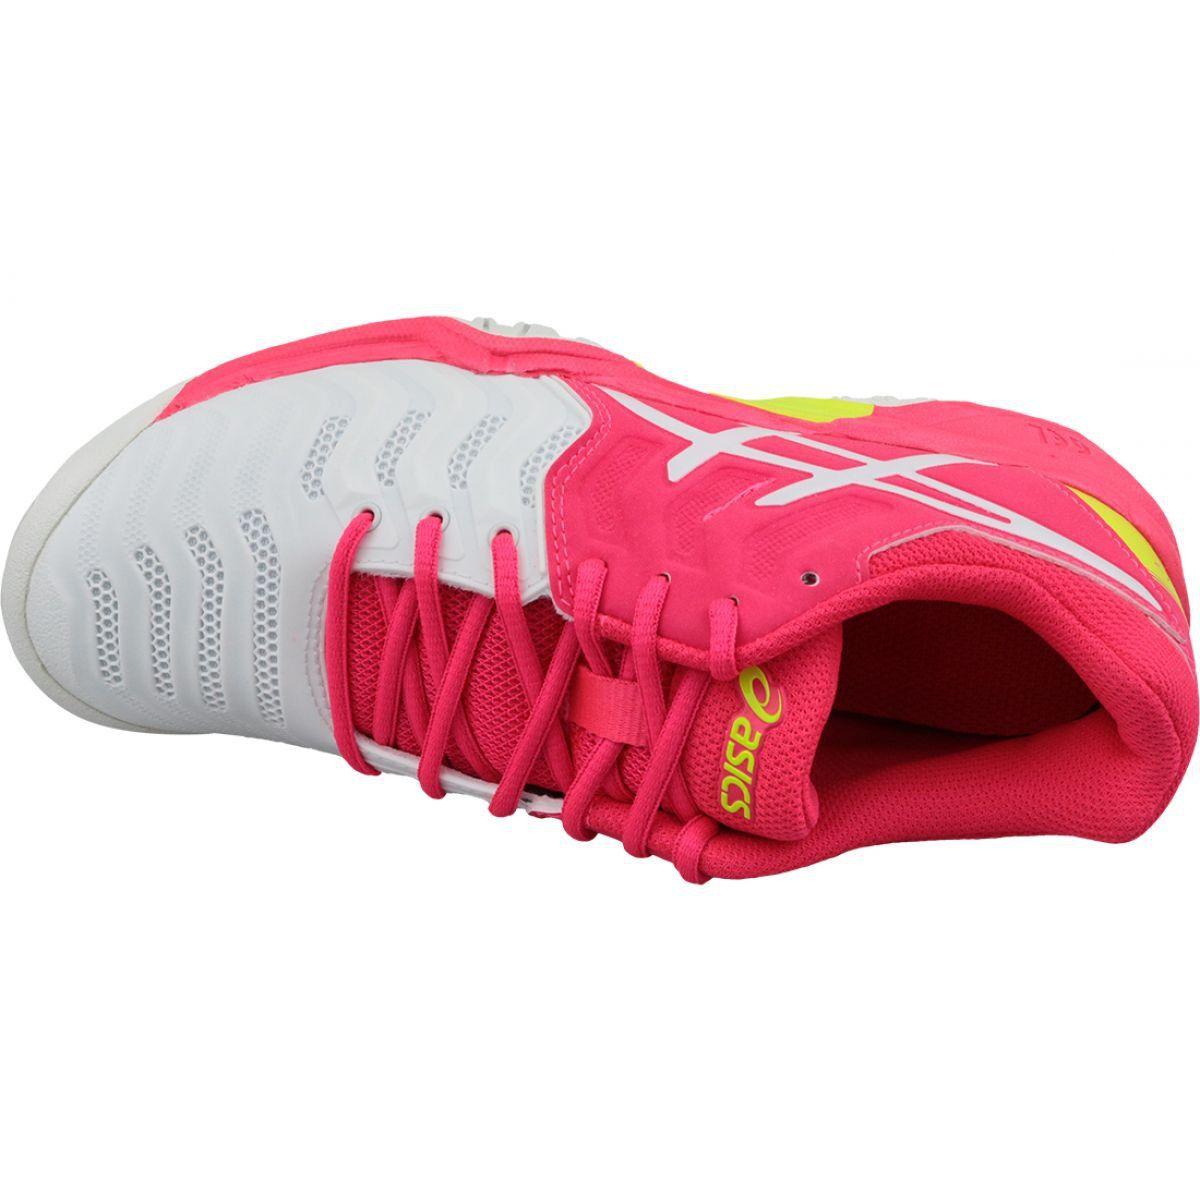 Tenis Ziemny Sport Asics Buty Tenisowe Asics Gel Resolution 7 Gs Jr C700y 116 Asics Asics Gel Girls Shoes